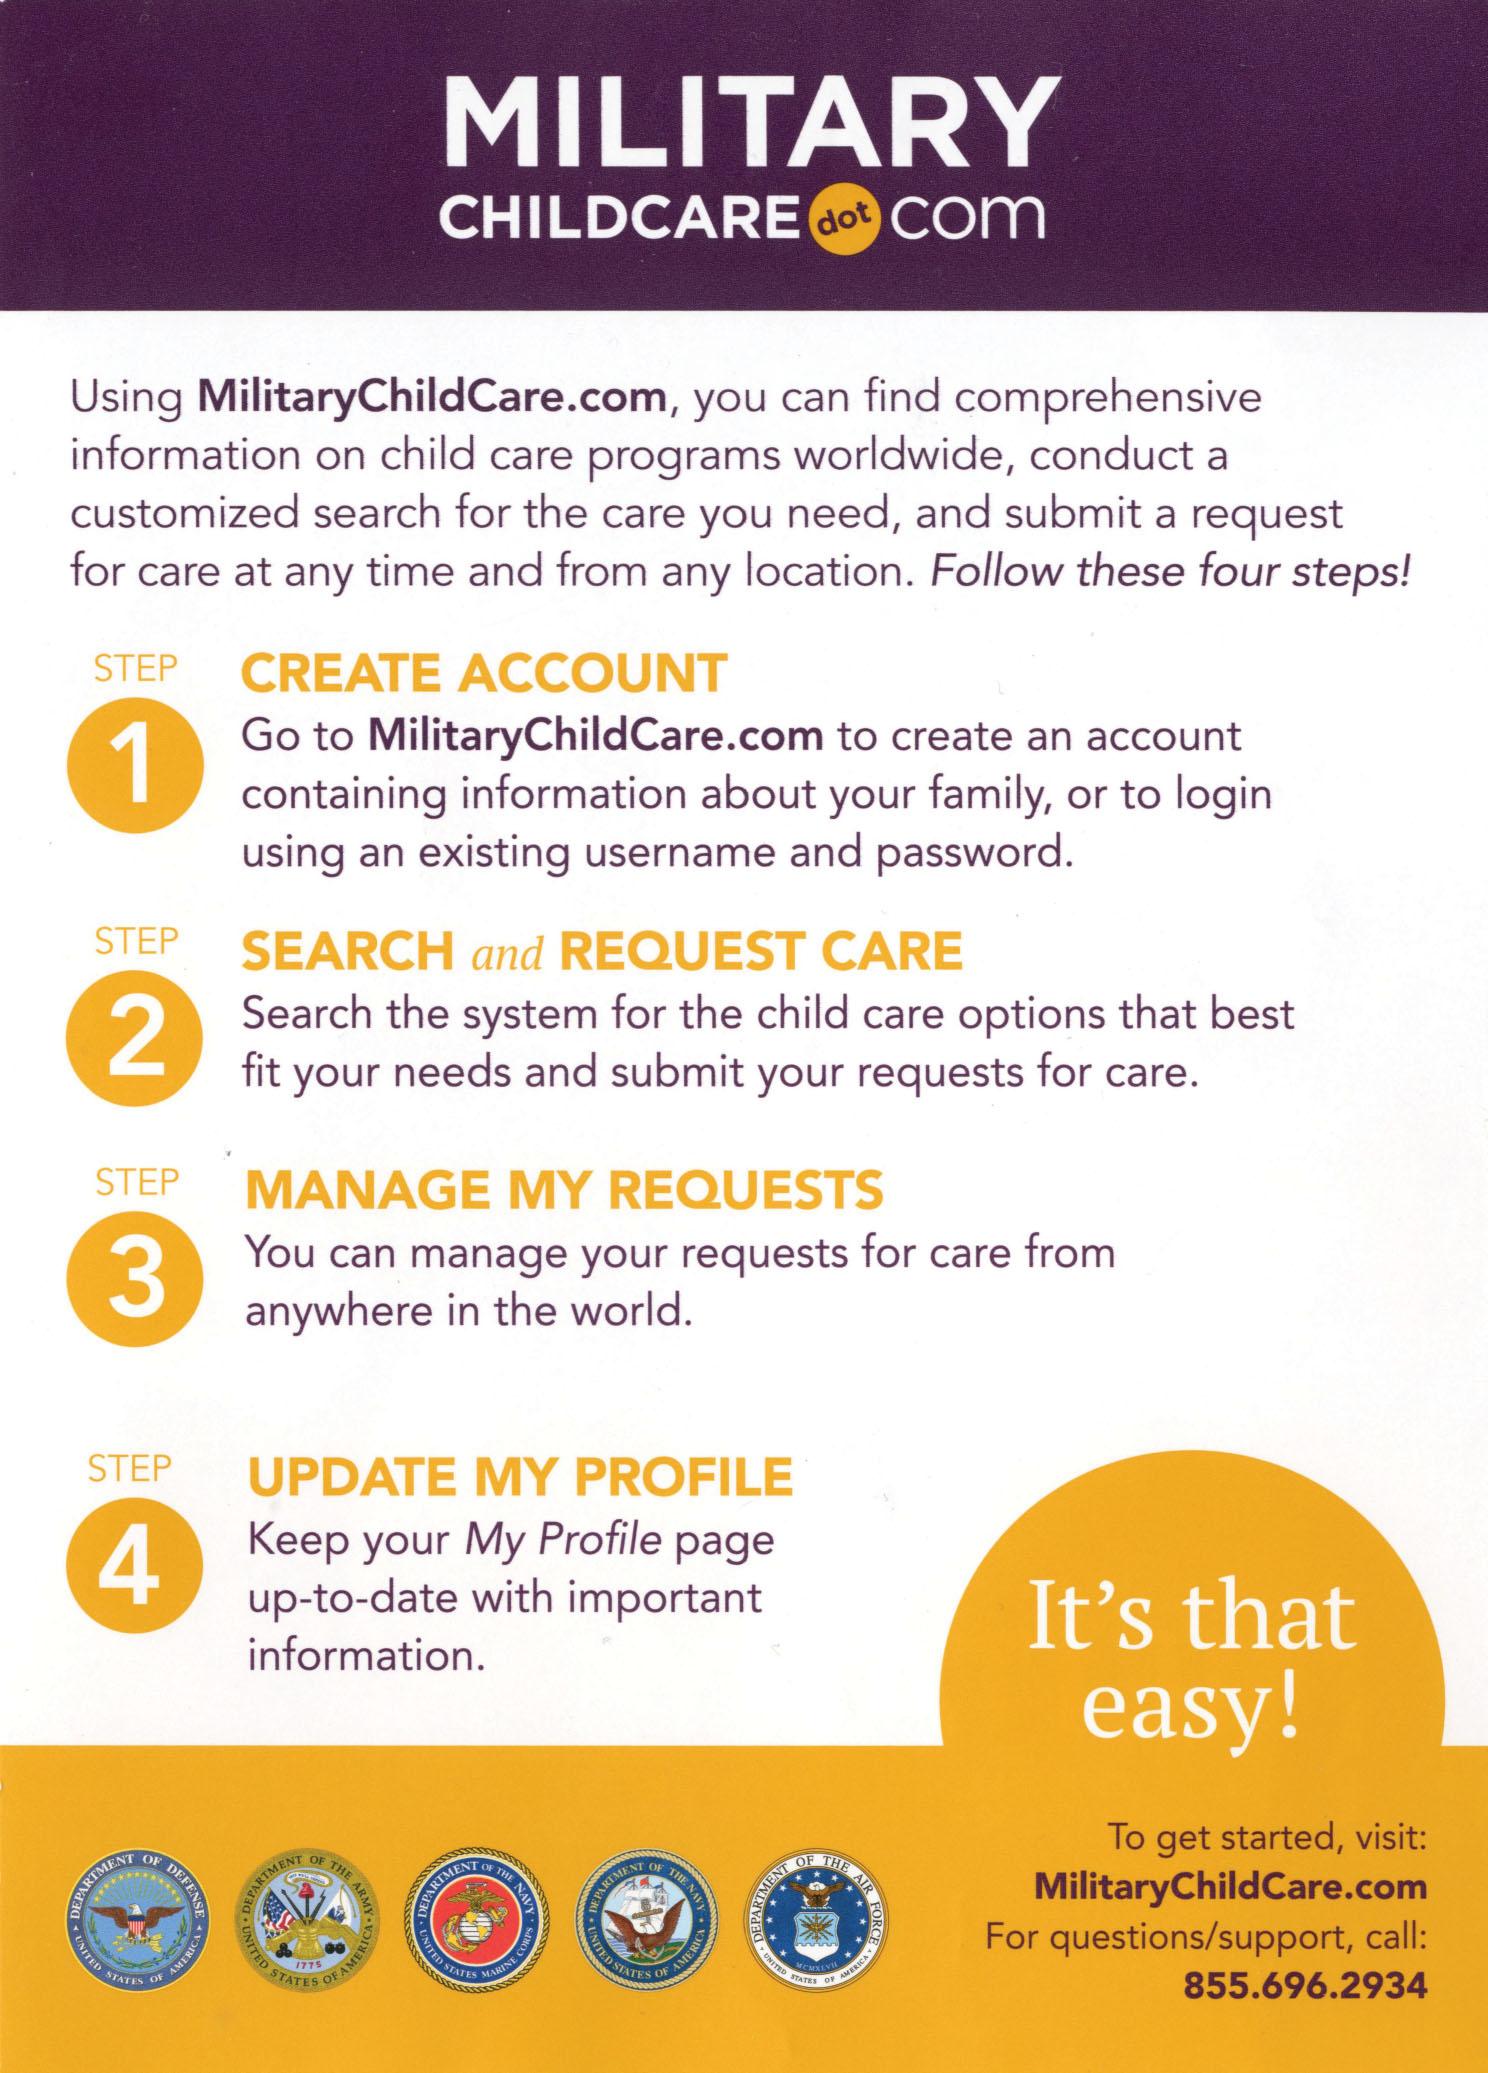 Virtual Carlisle Barracks Child & Youth Services Registration